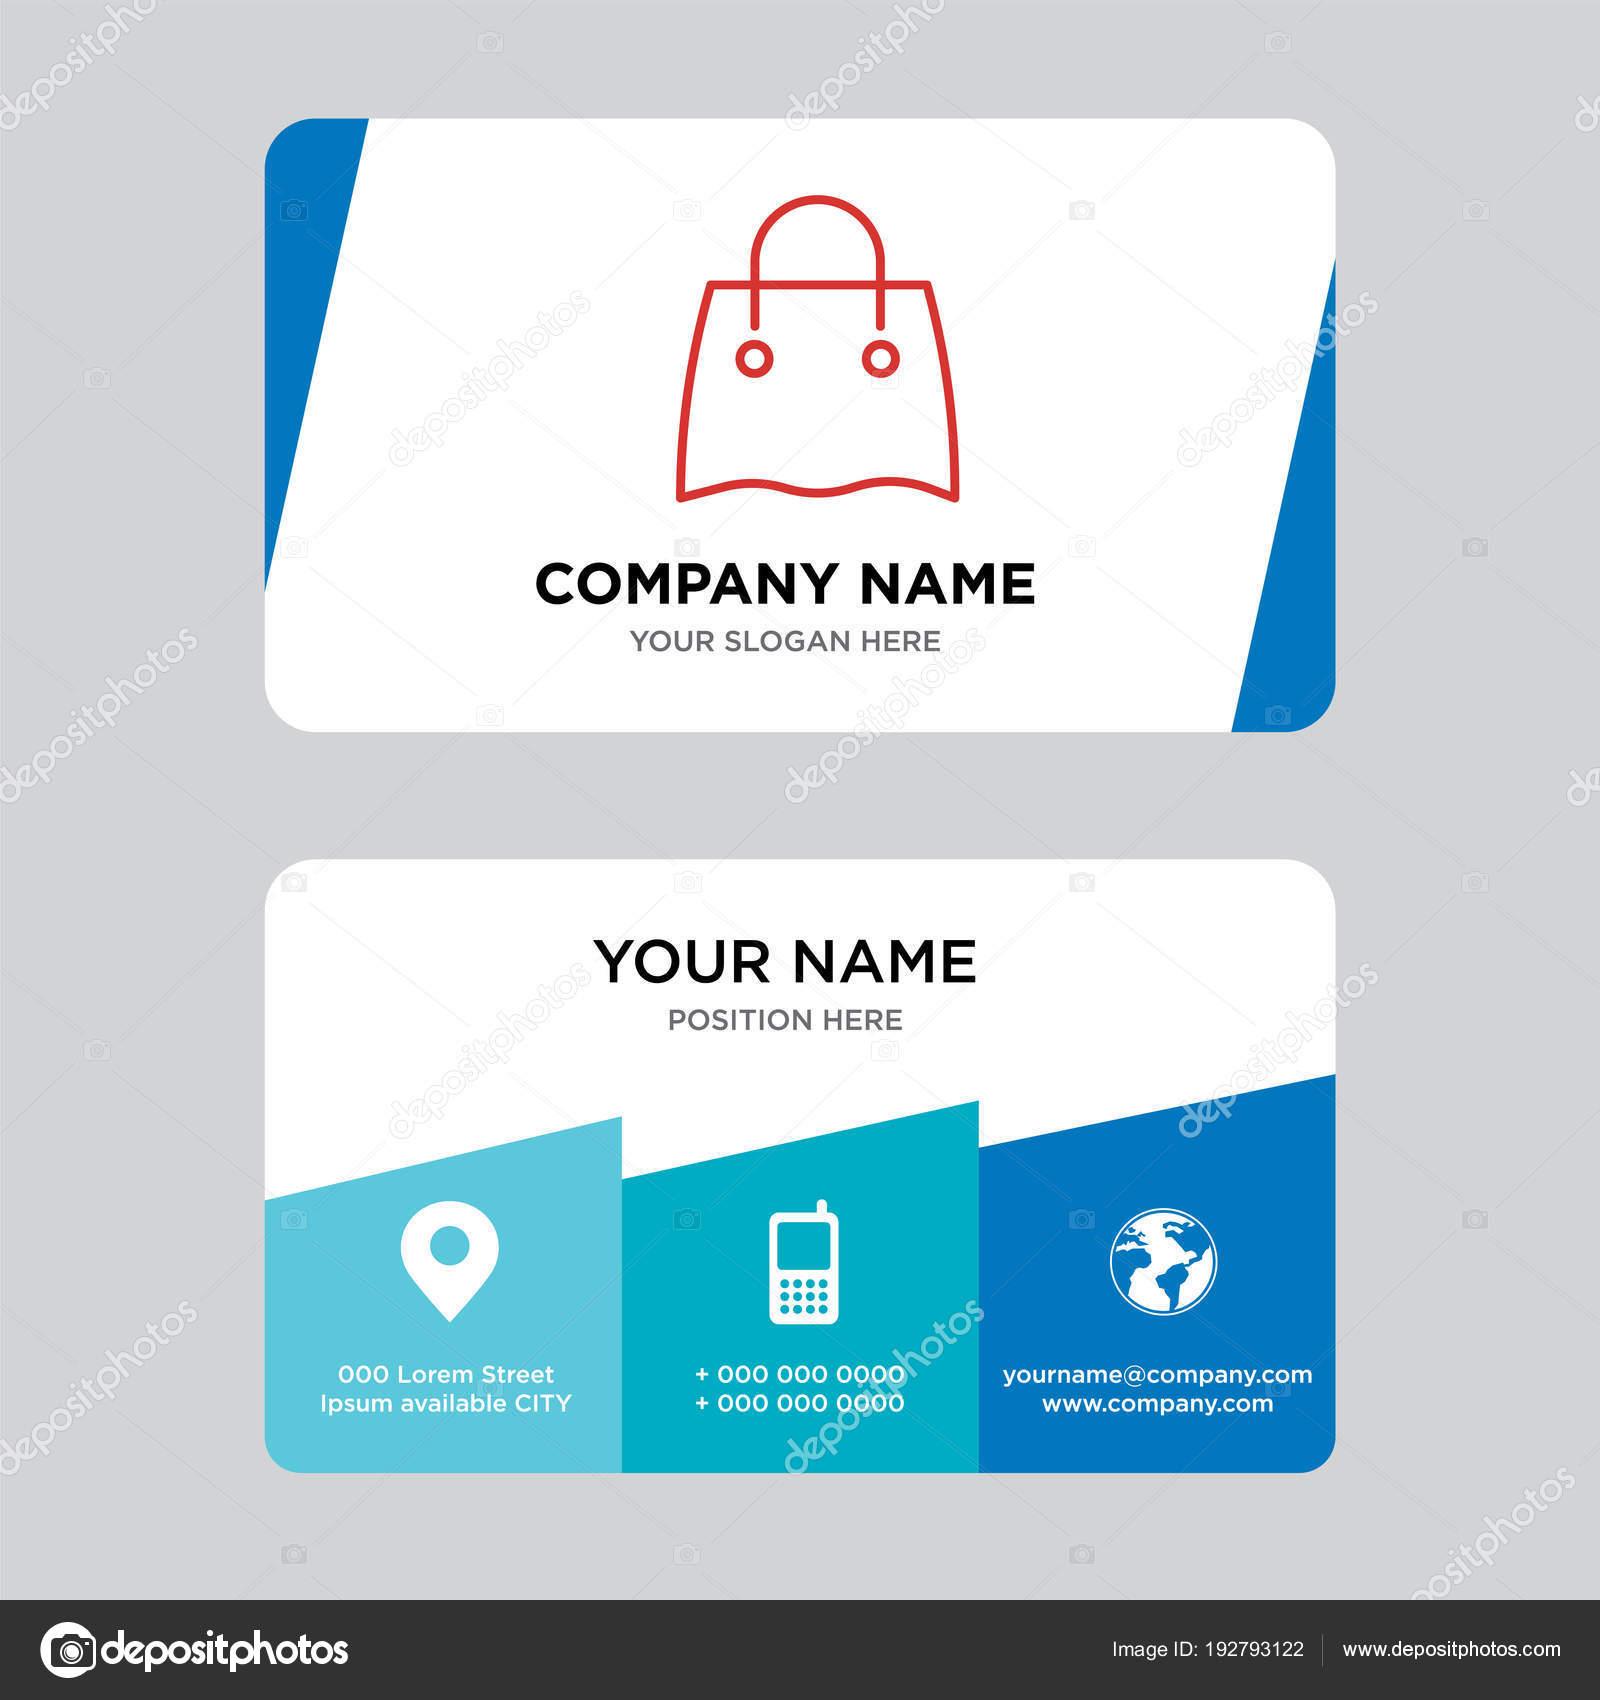 Reusable shopping bag business card design template stock vector reusable shopping bag business card design template stock vector colourmoves